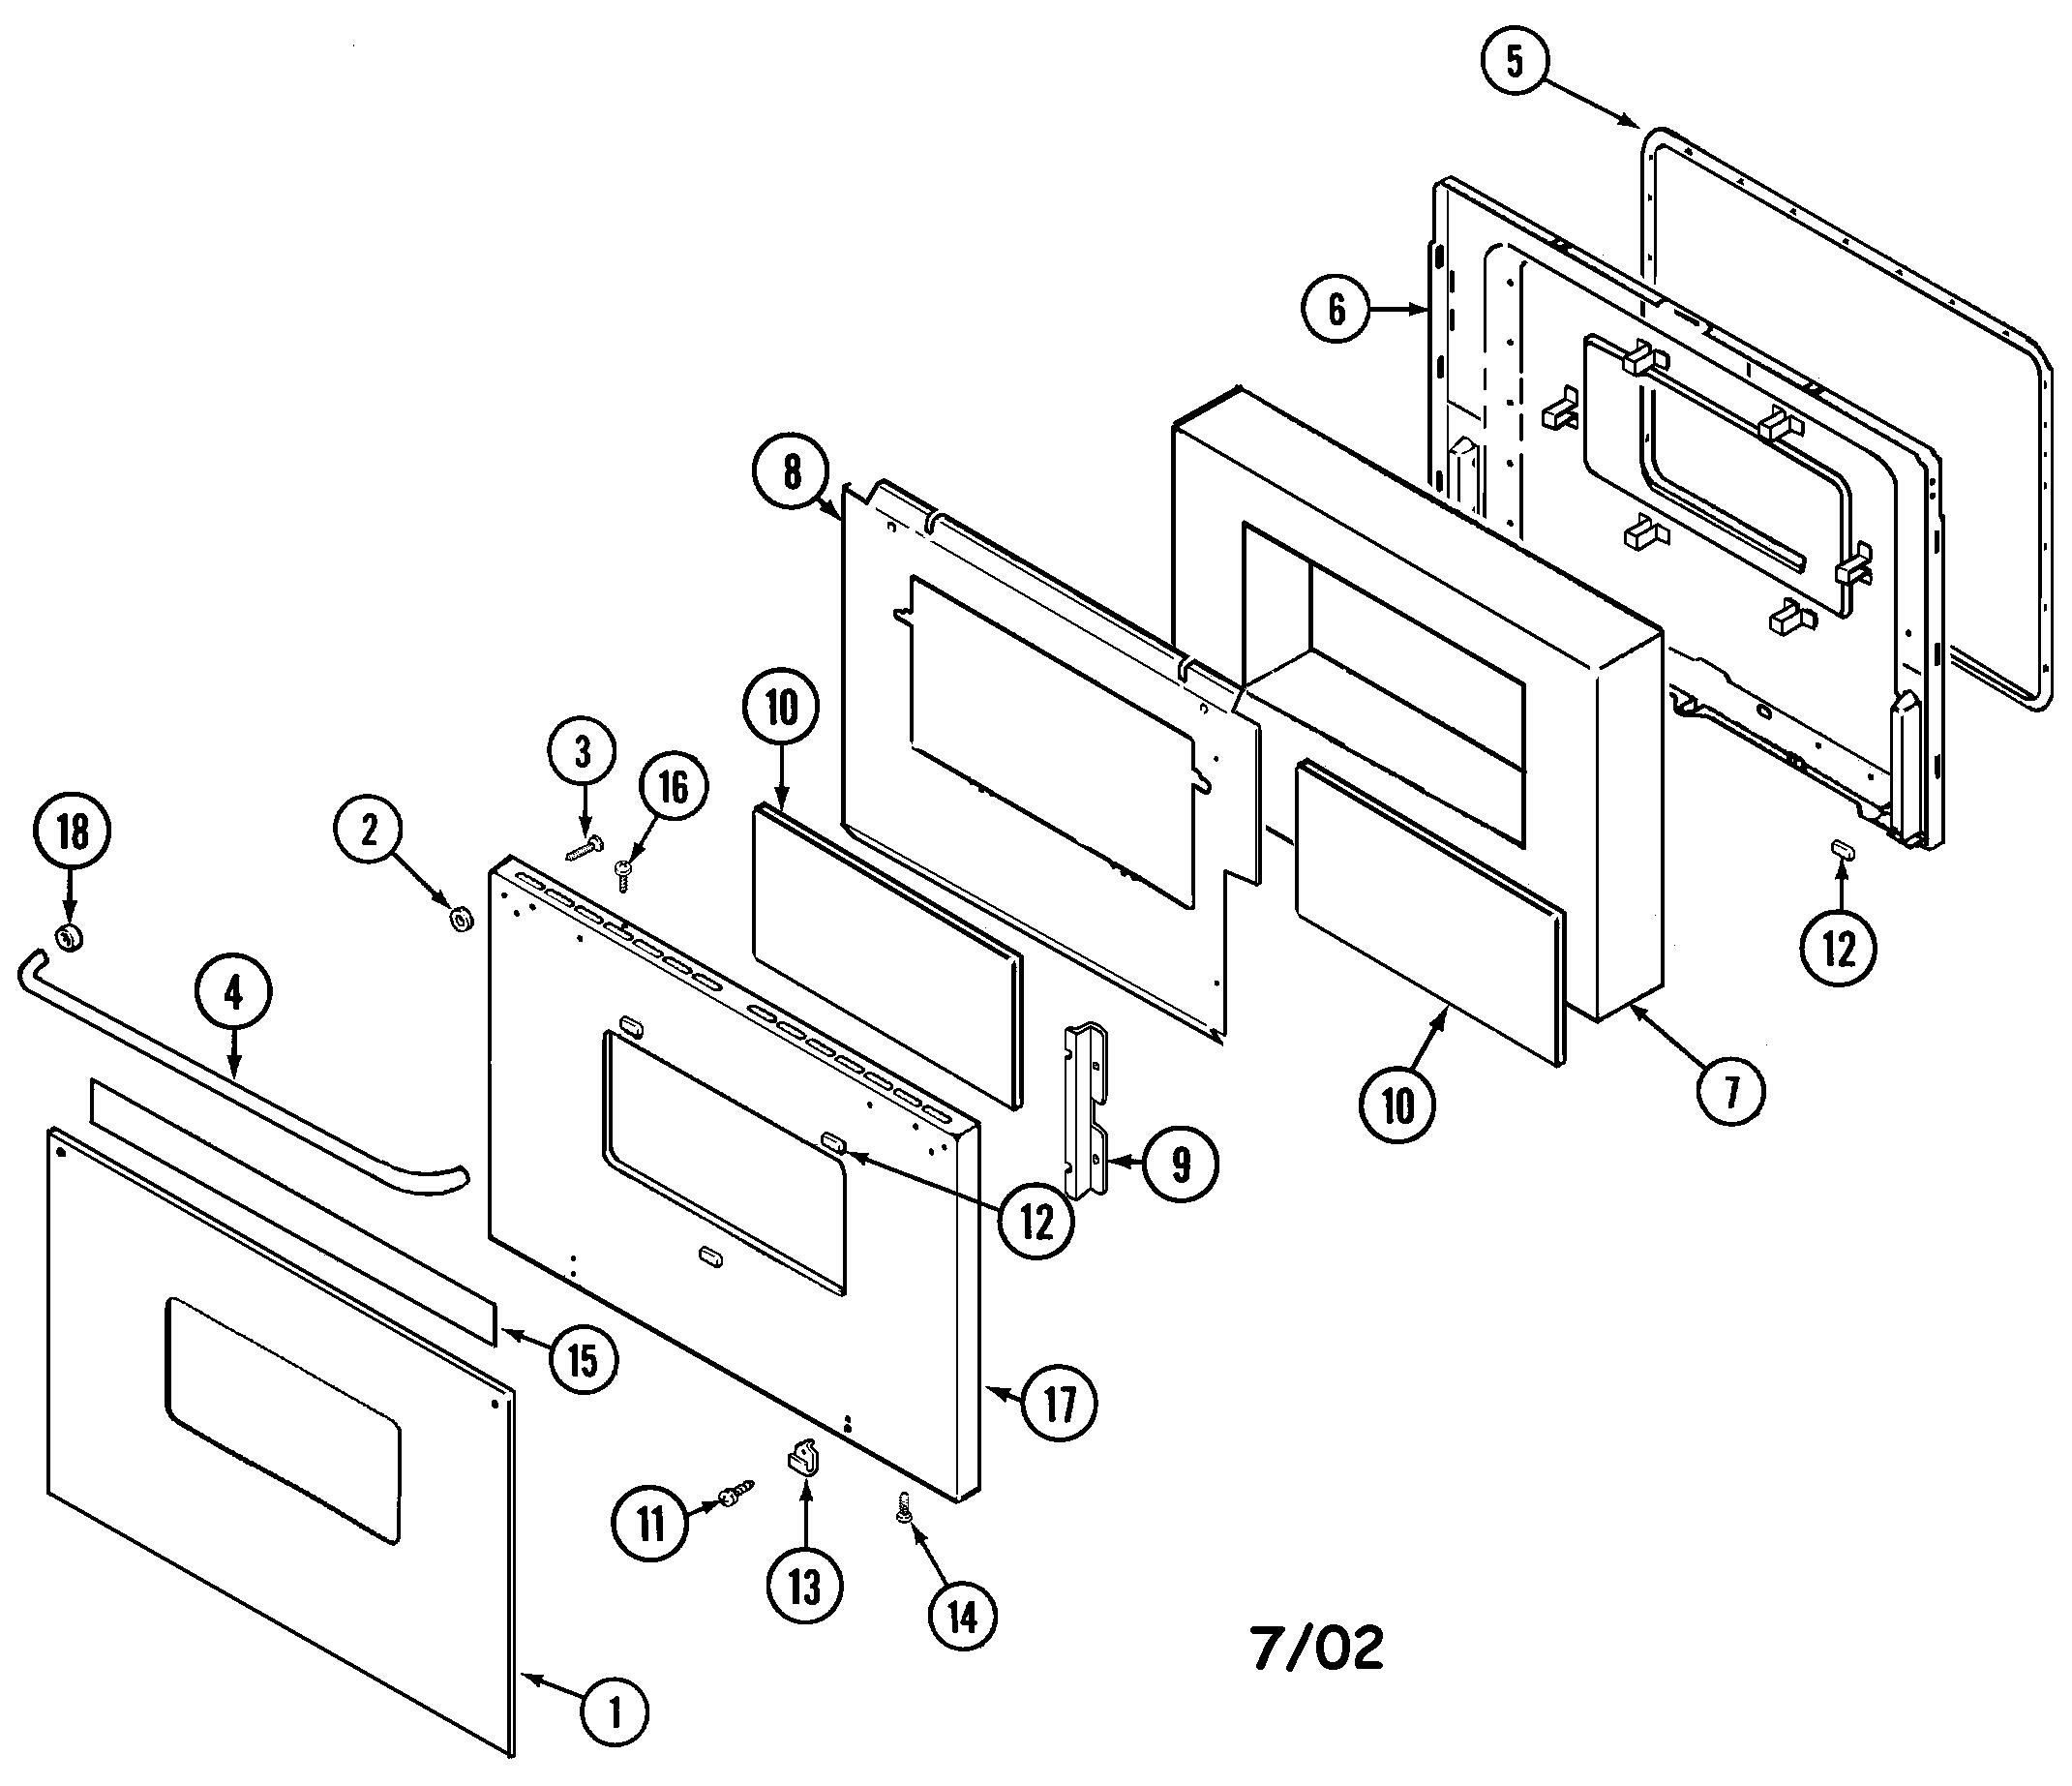 1980 Yamaha Xt250 Wiring Diagram 1980 Honda Cx500 Wiring